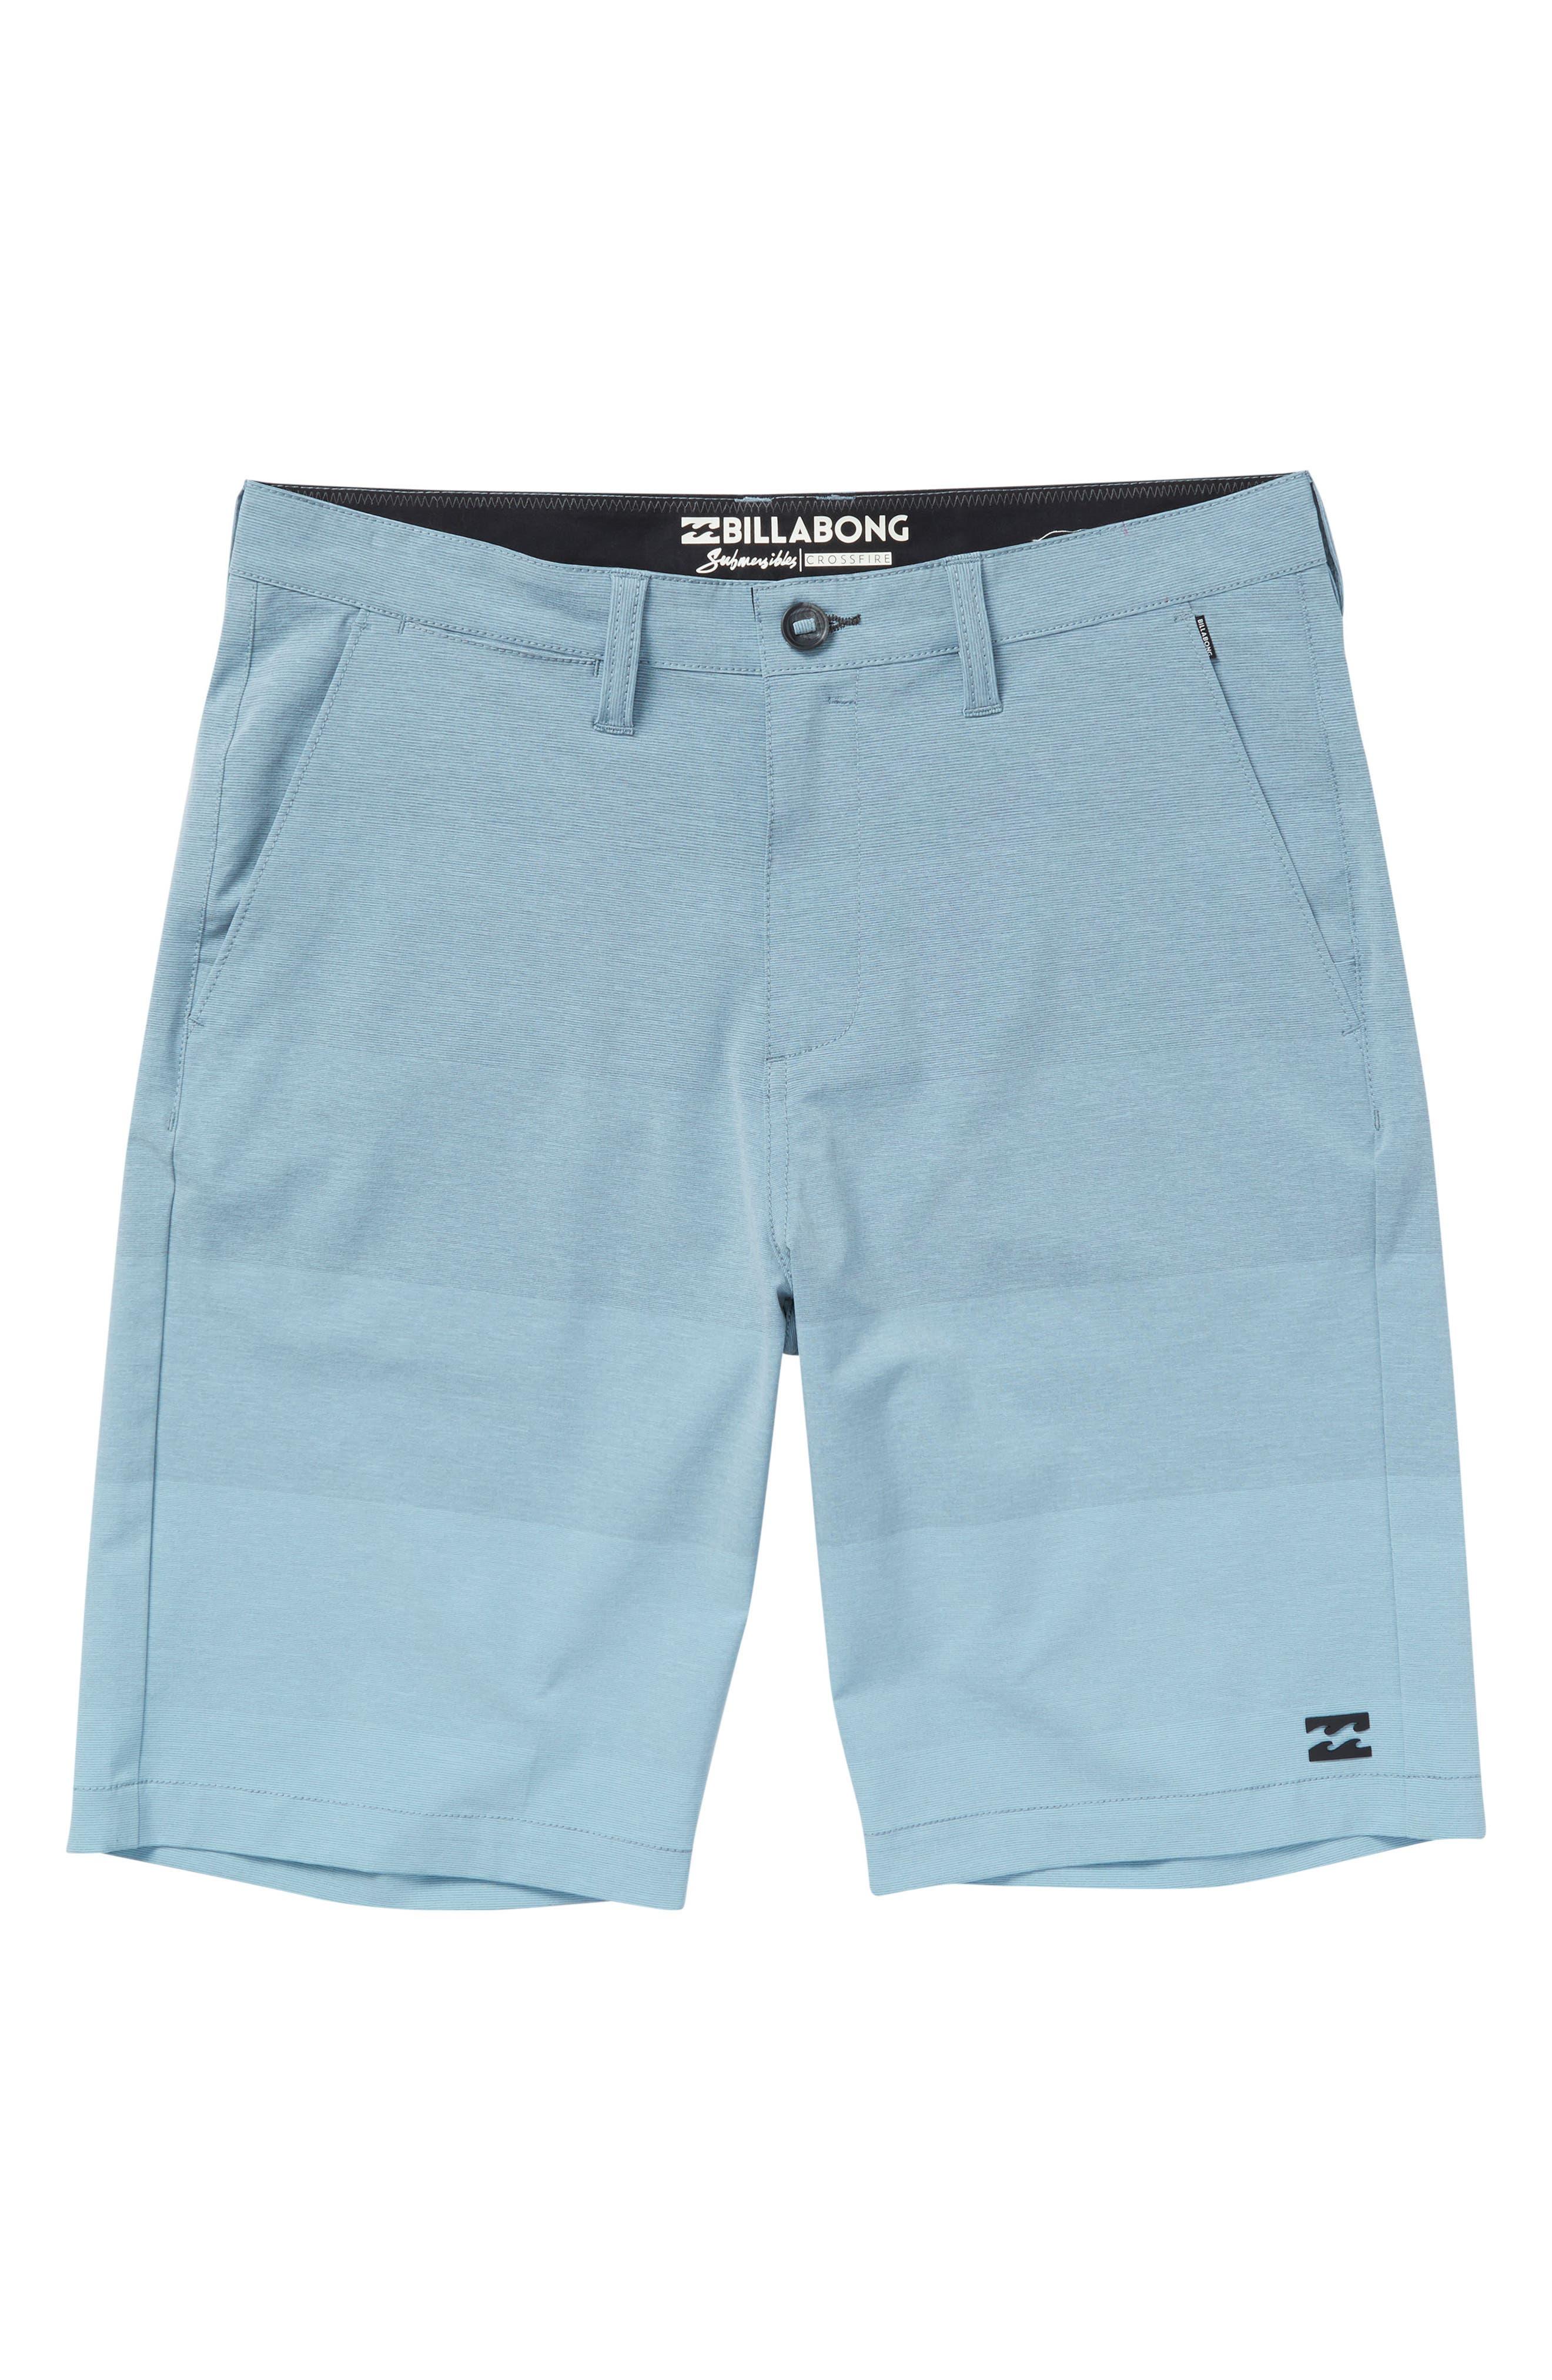 Crossfire X Faderade Hybrid Shorts,                             Main thumbnail 1, color,                             Blue